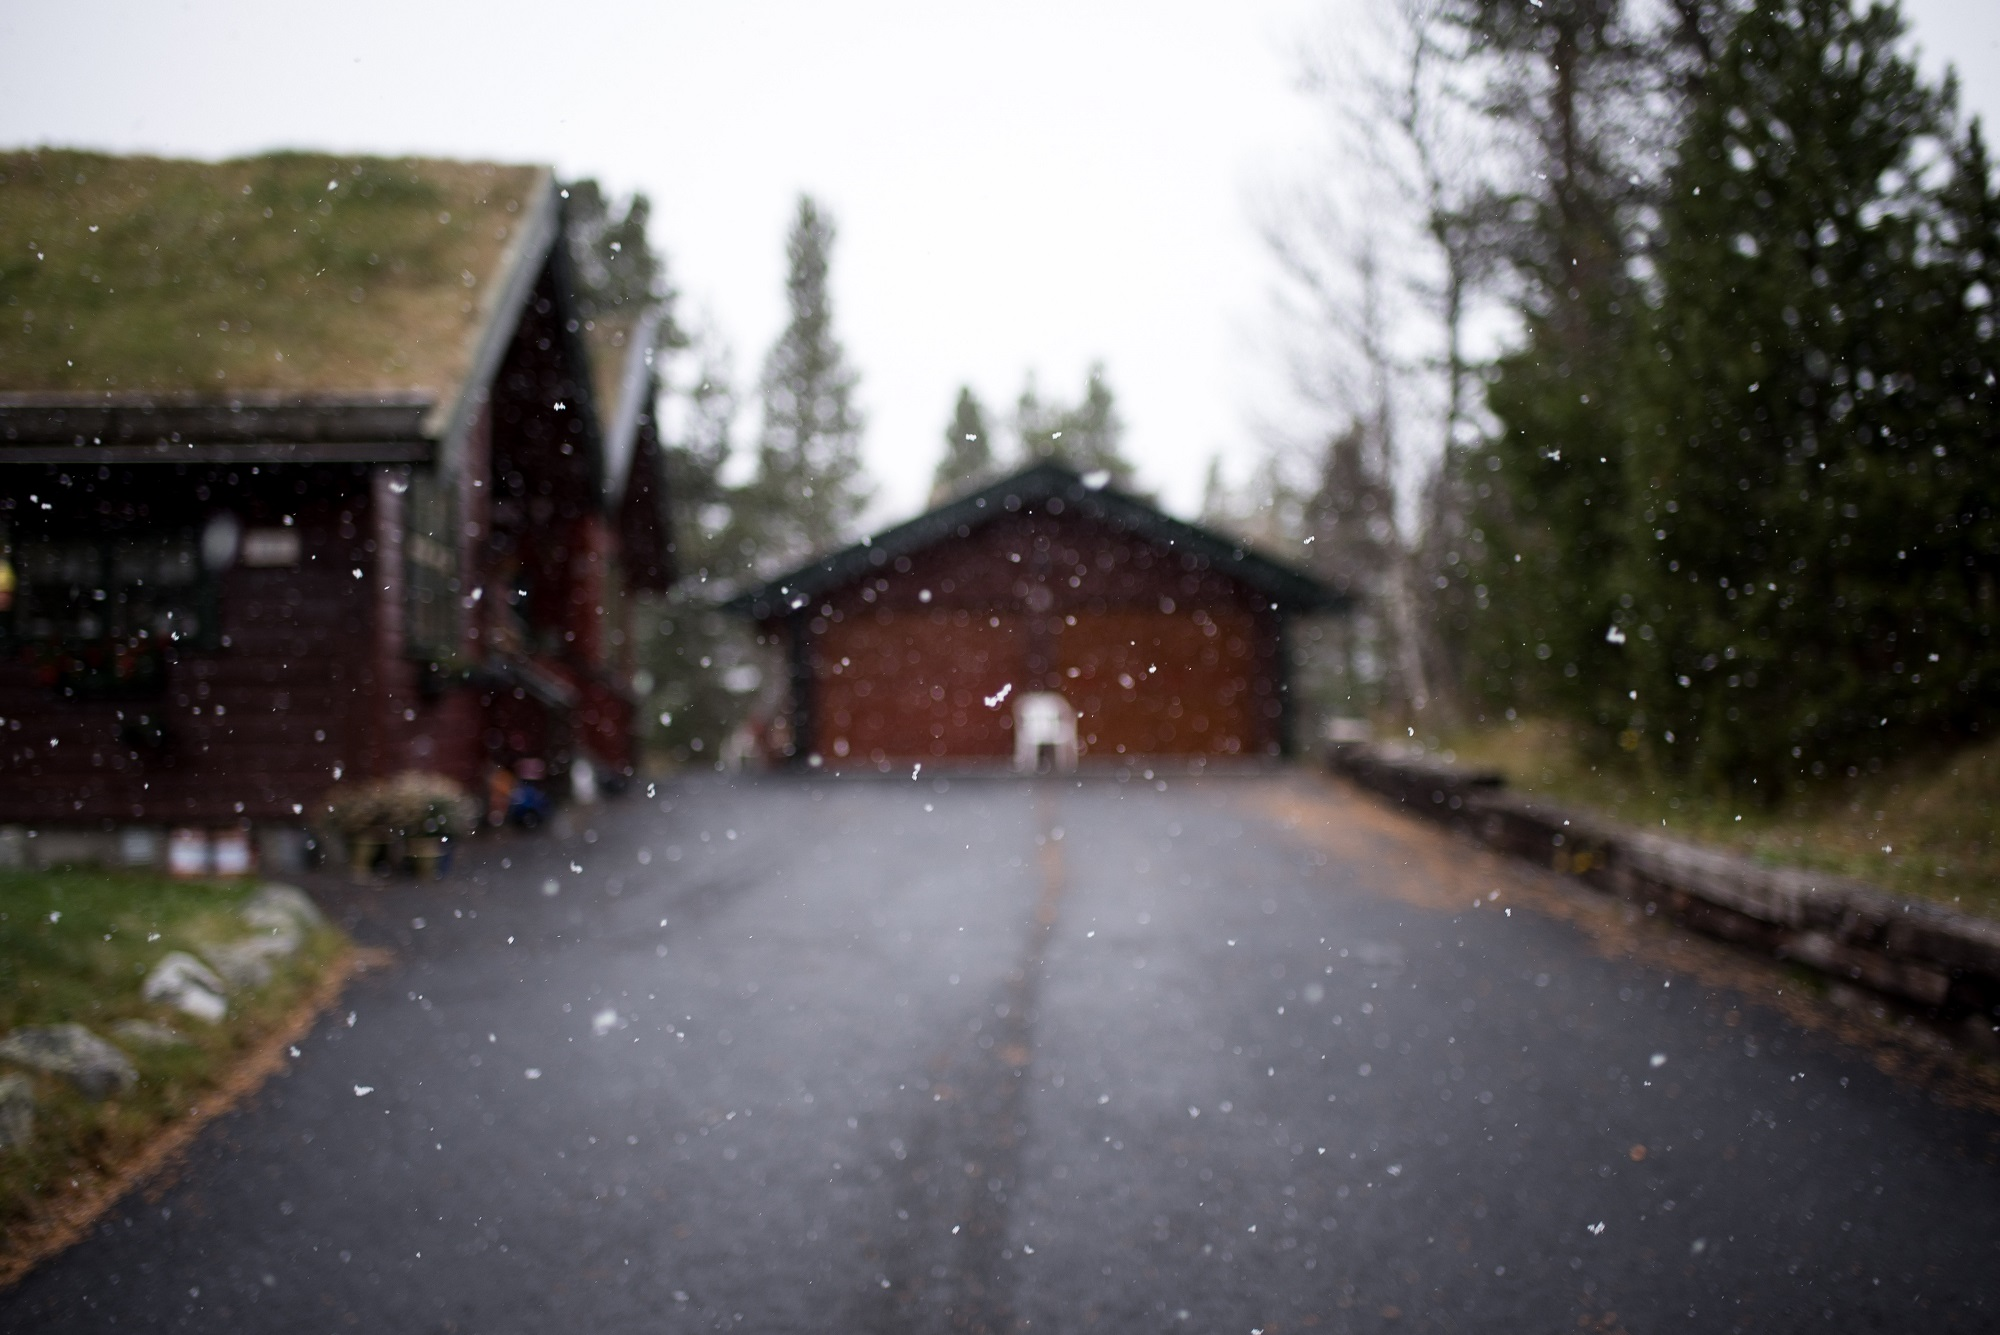 asphalt driveway in the winter